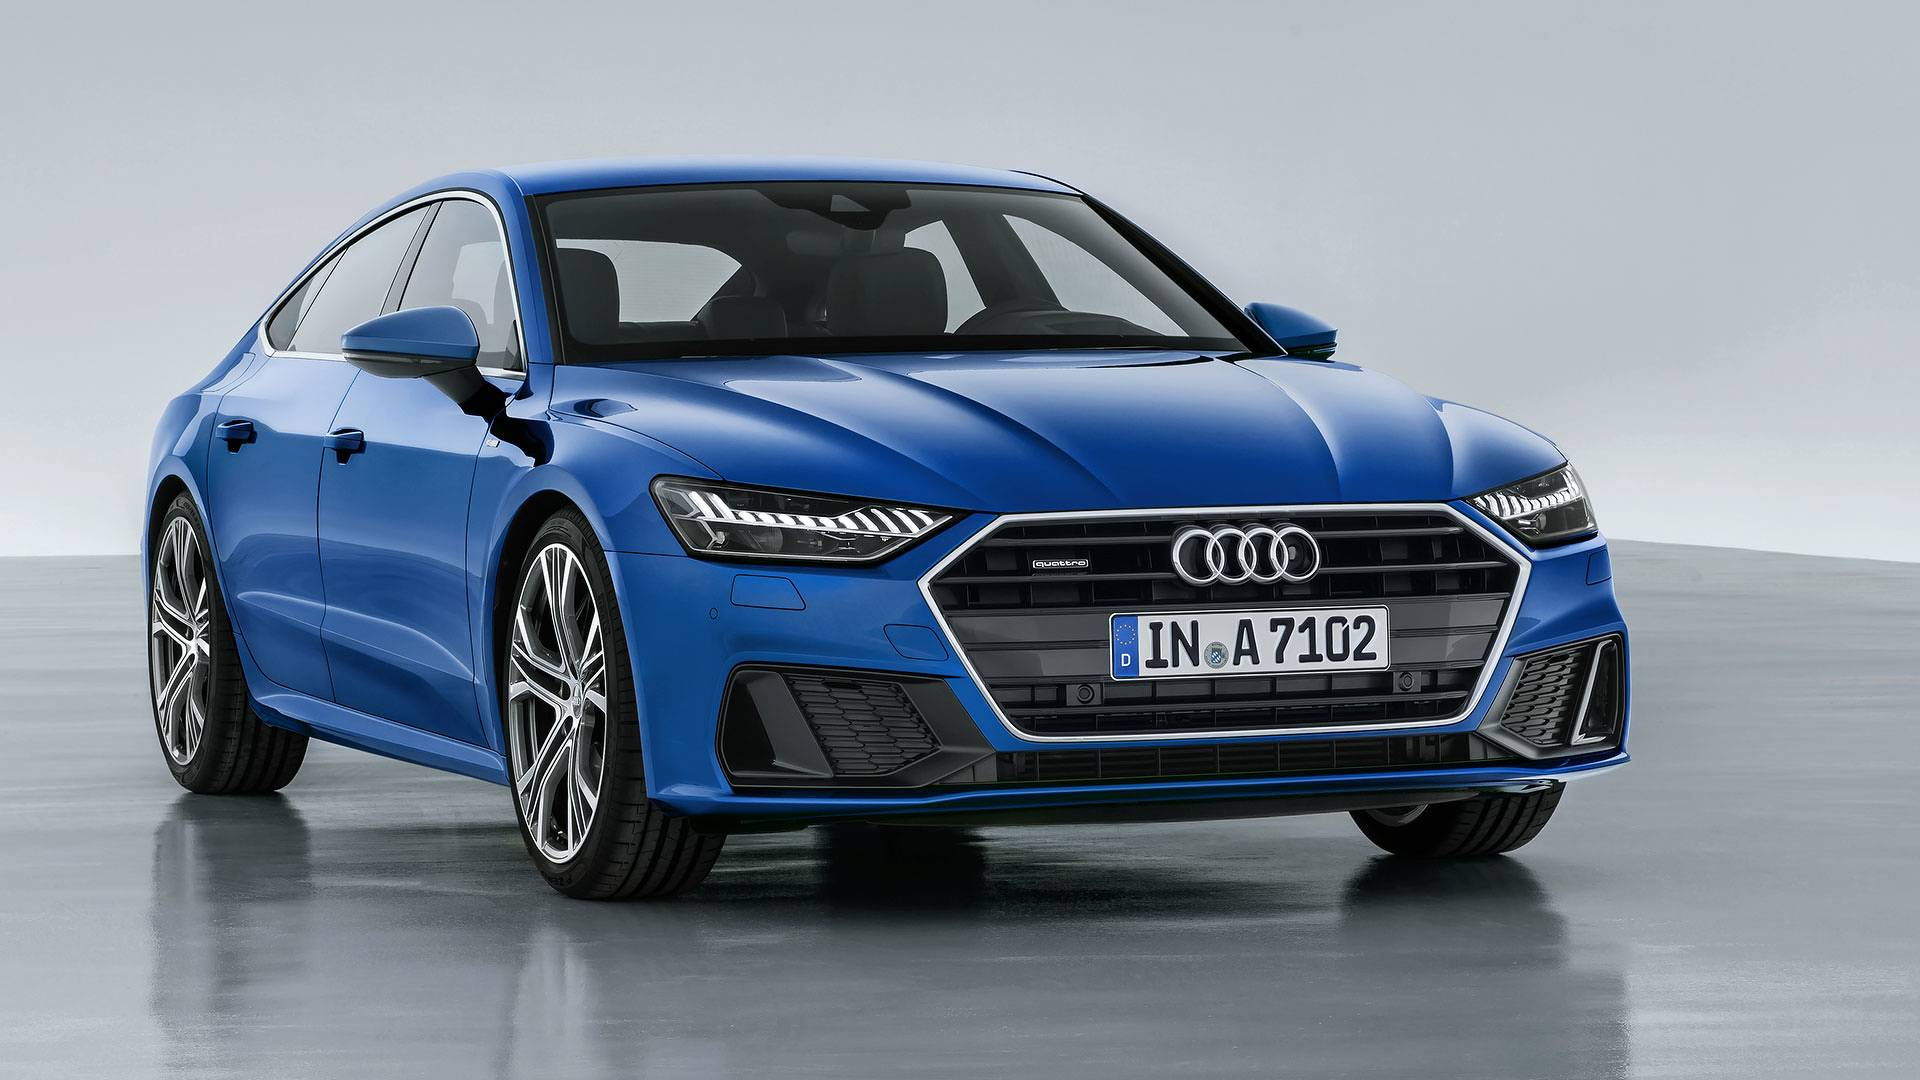 2019 audi a7 آئودی A7 مدل ۲۰۱۹ رونمایی شد   اجاره ماشین